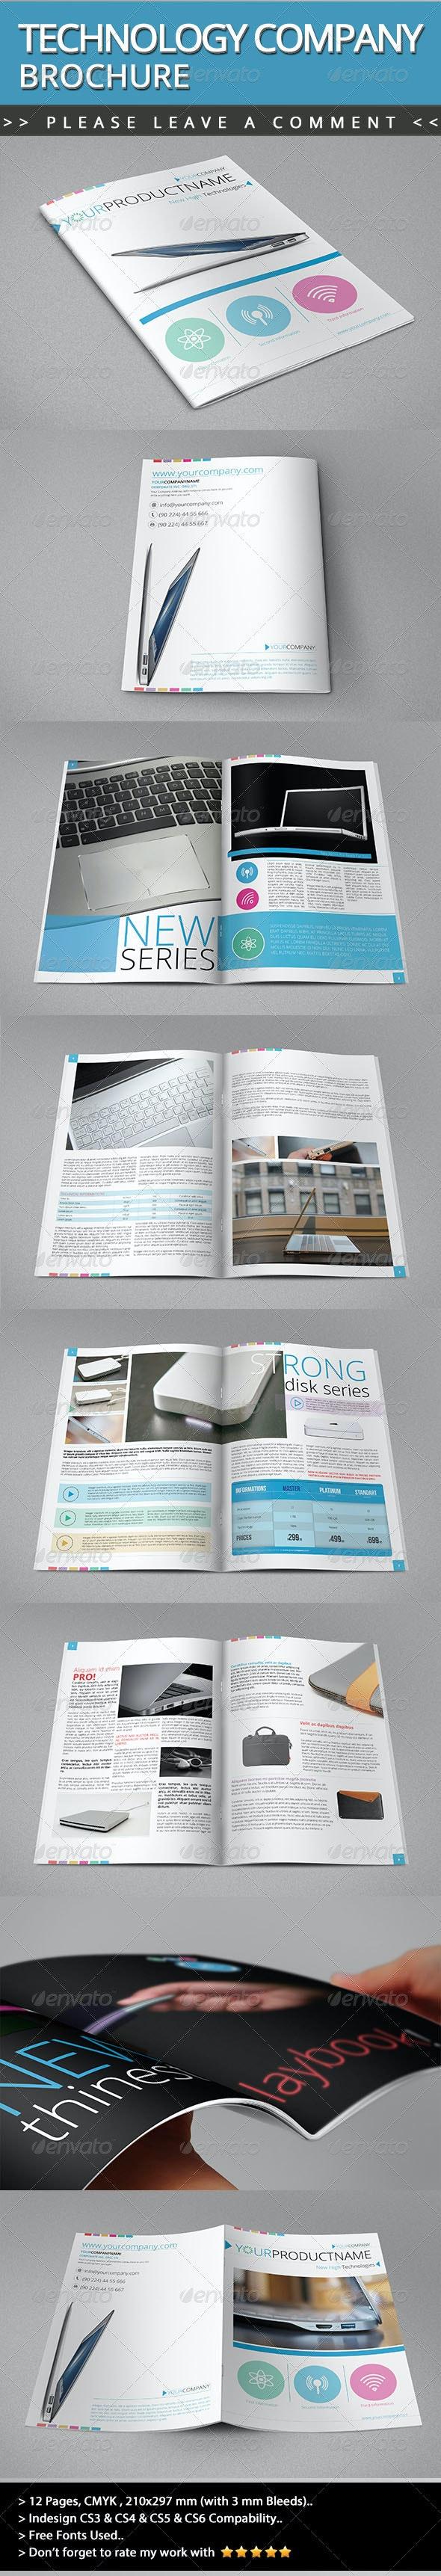 Technology Company Brochure V01 - Informational Brochures